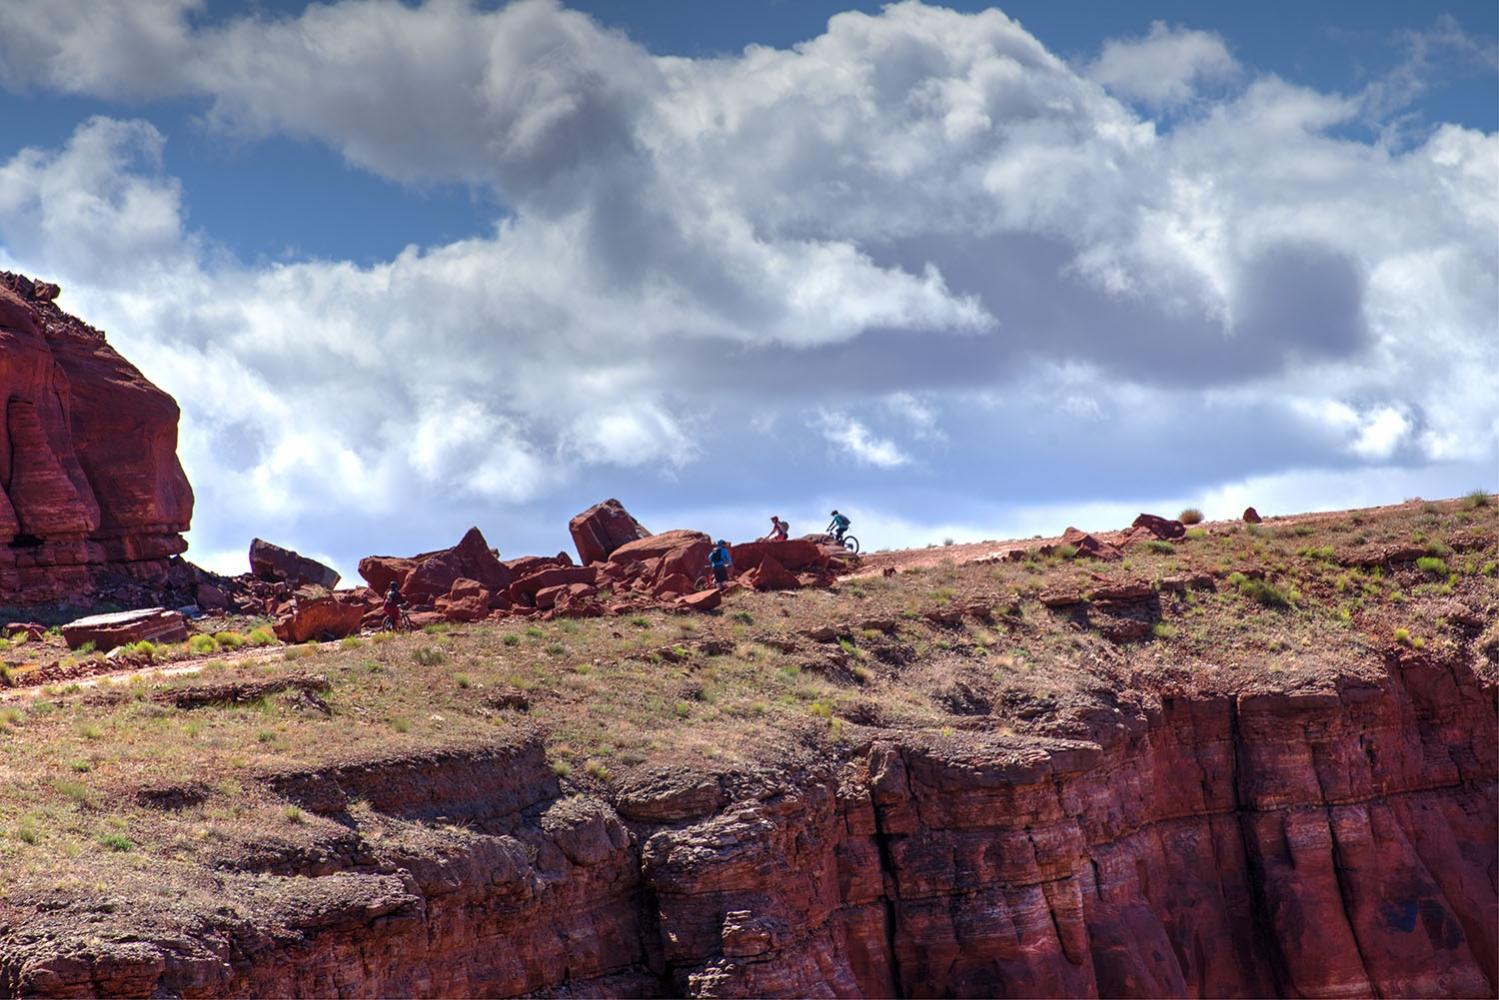 Canyonlands-National-Park-Full-Day-Guided-Mtb-Tour-Climb-Horizon-1